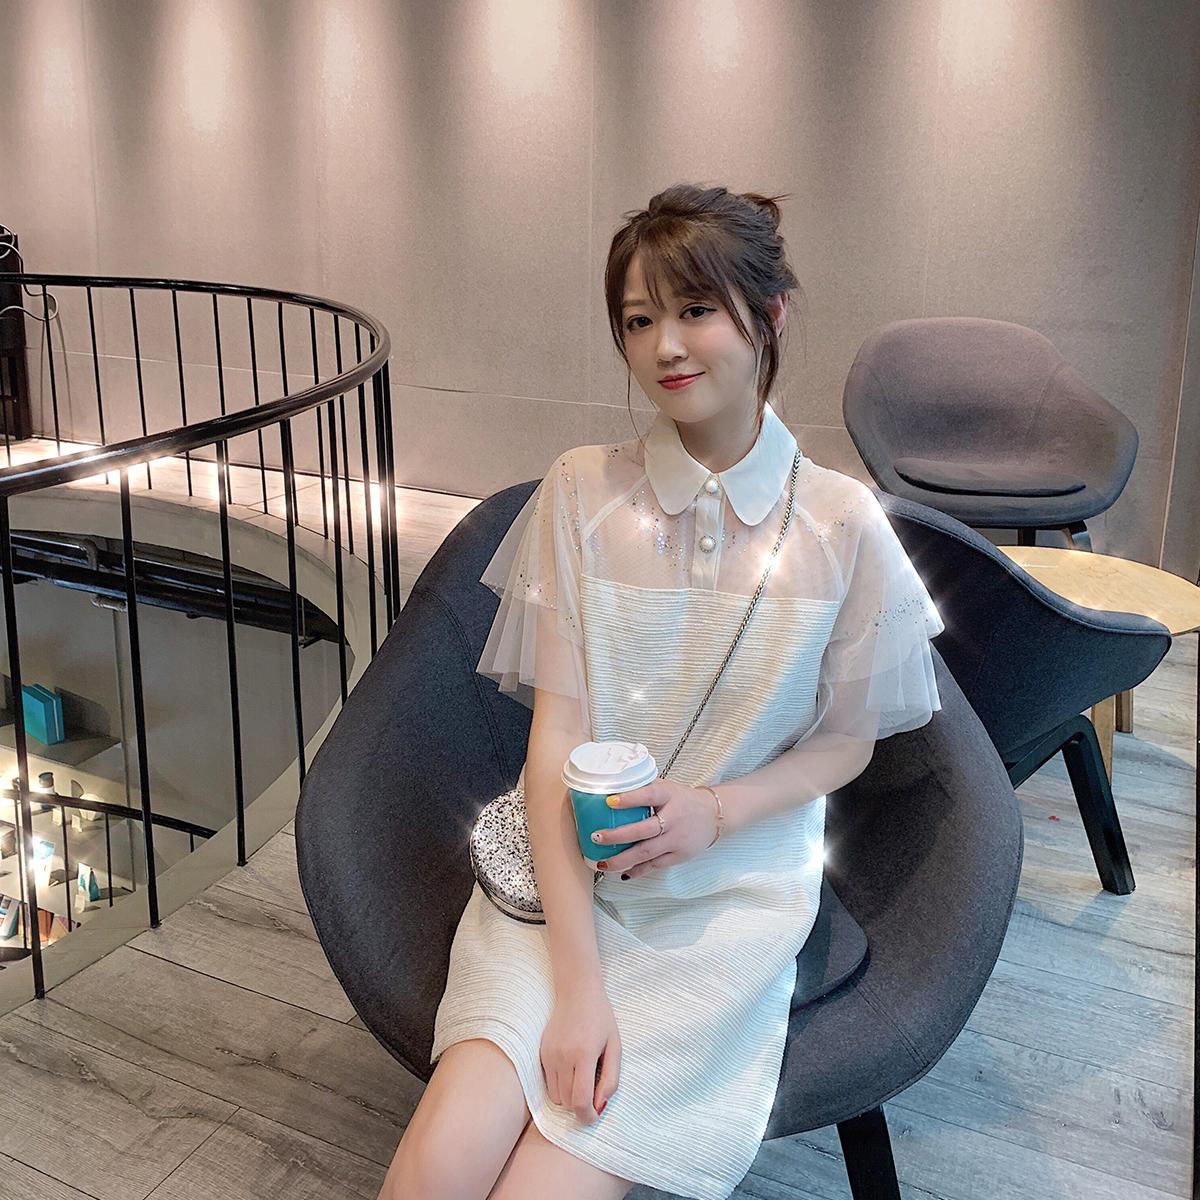 AHY网红流行裙子女2019新款夏显瘦气质短袖连衣...¥159